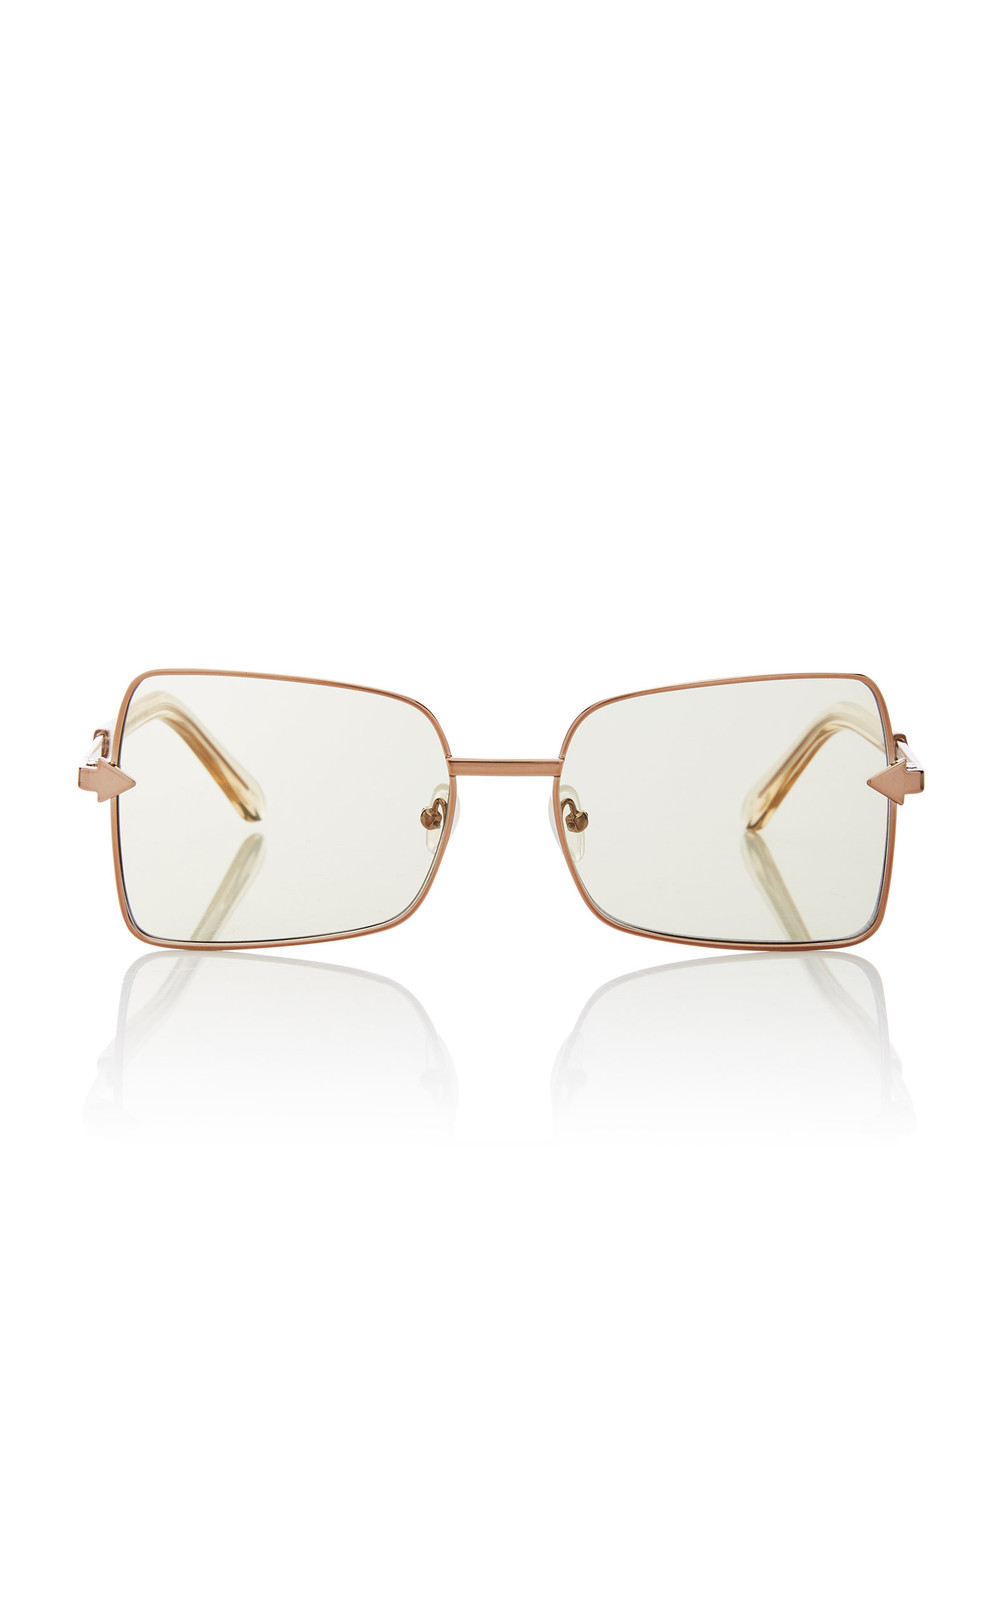 Karen Walker Wisdom Square-Frame Gold-Tone Sunglasses in green